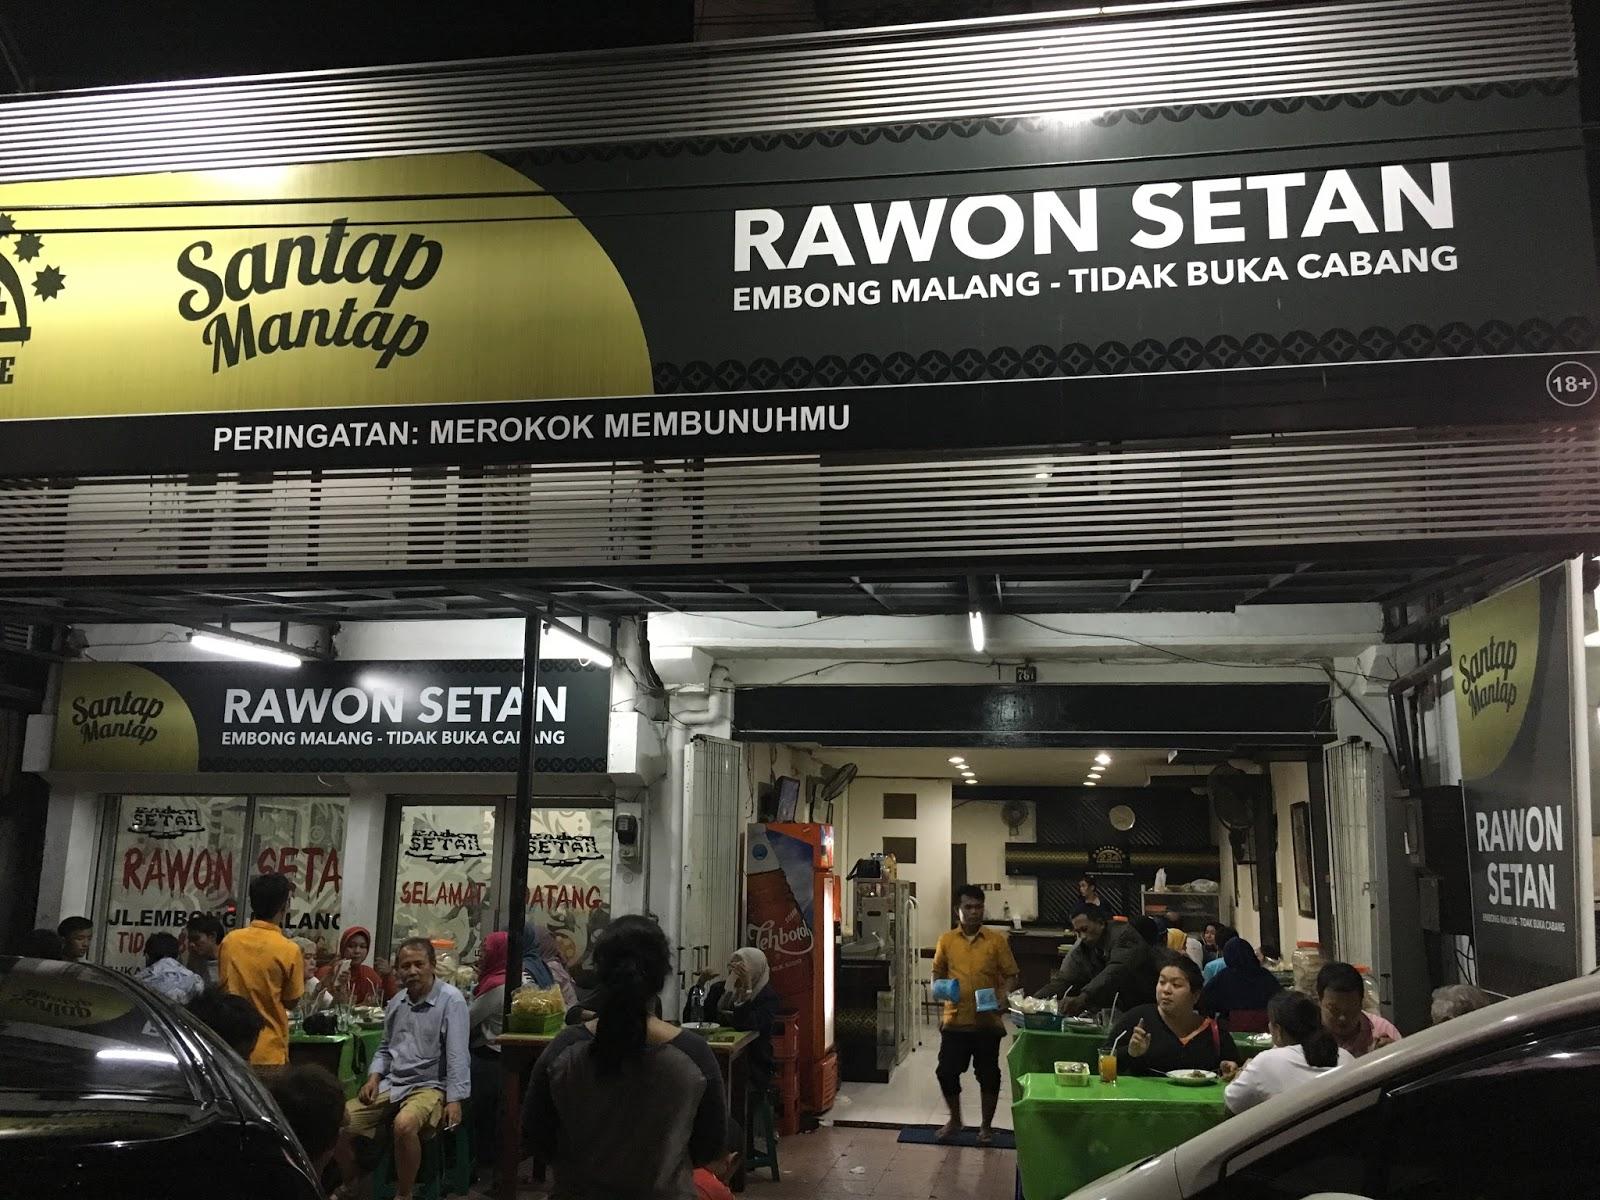 Rawon Setan Kuahnya Nendang dan Khas Surabaya  Kuliner